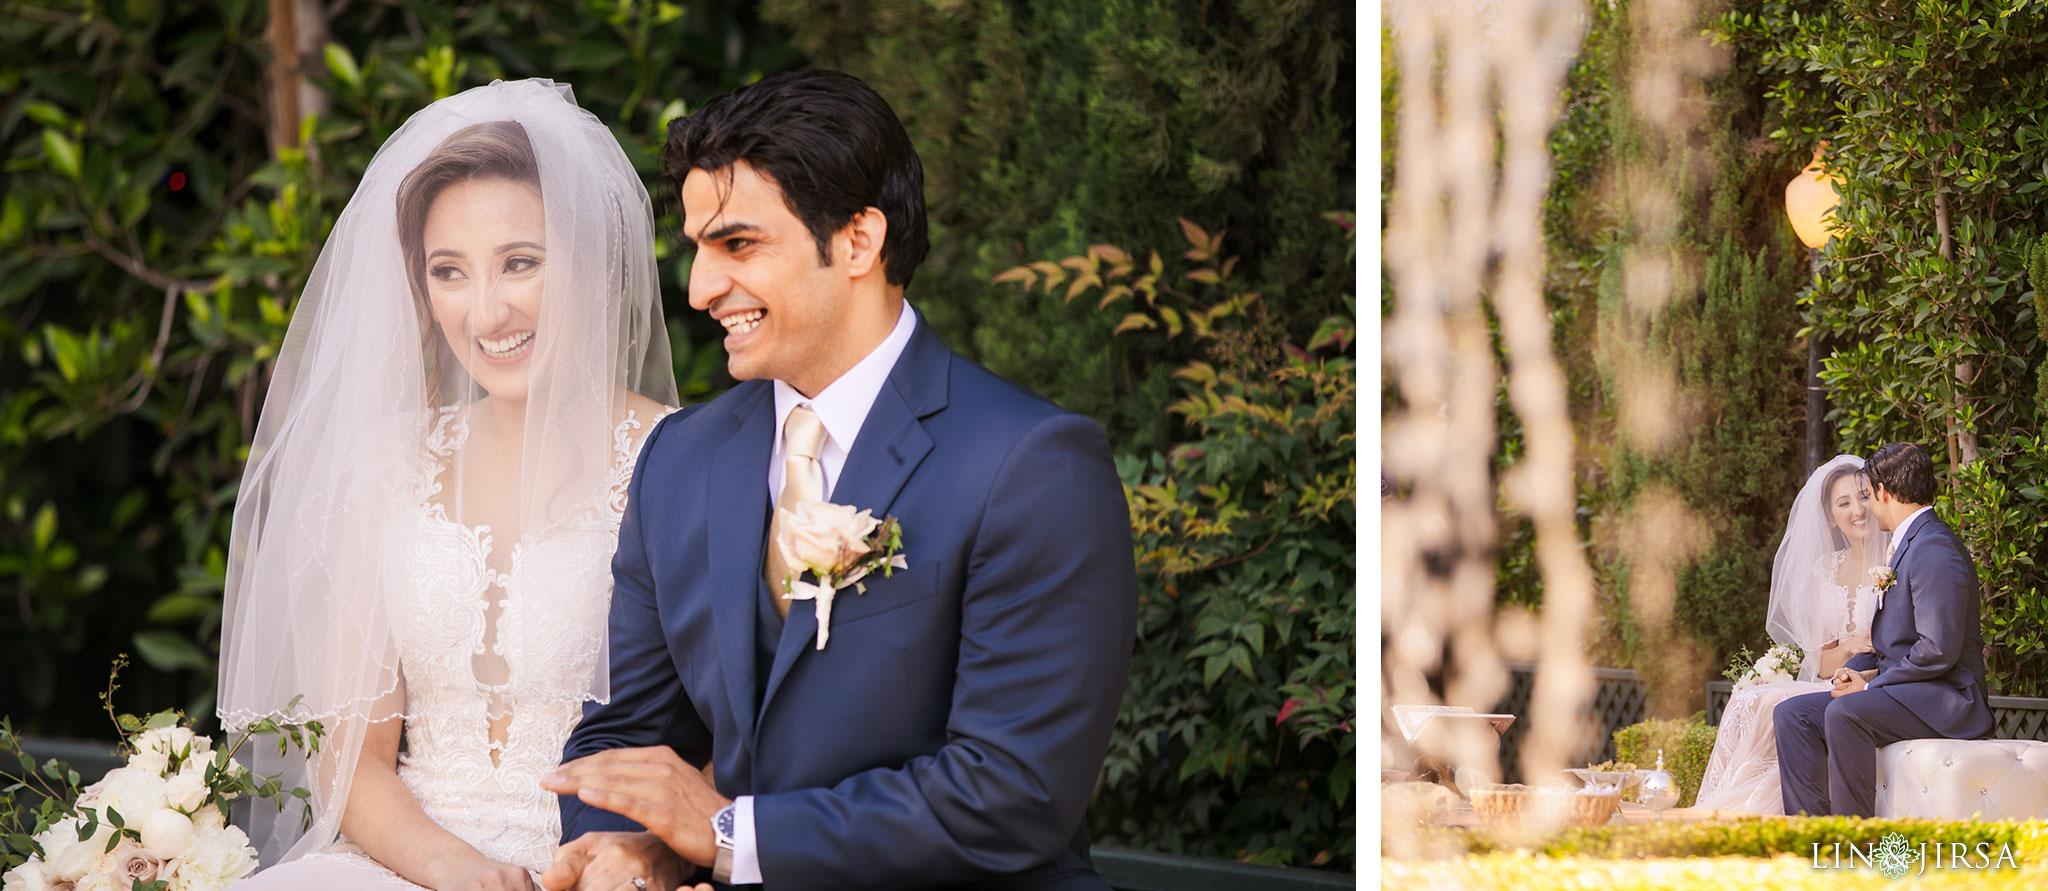 016 taglyan complex los angeles persian wedding photography